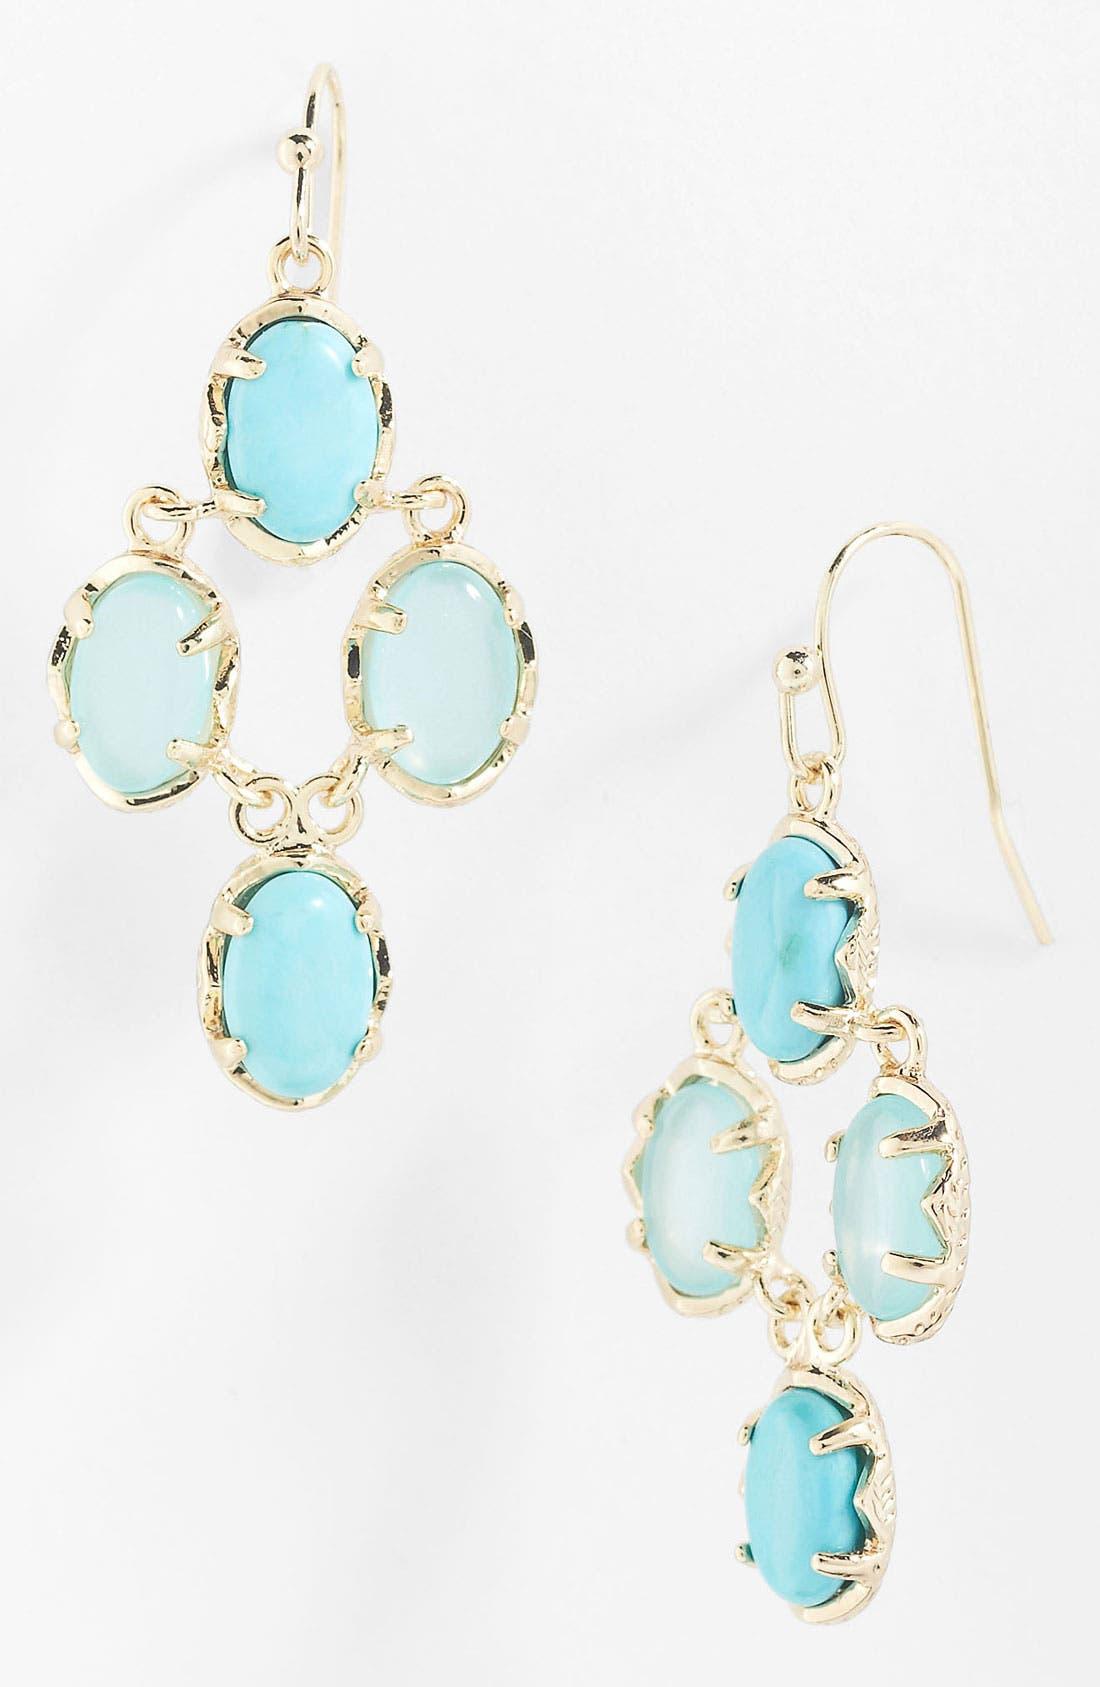 Alternate Image 1 Selected - Kendra Scott 'Melly' Chandelier Earrings